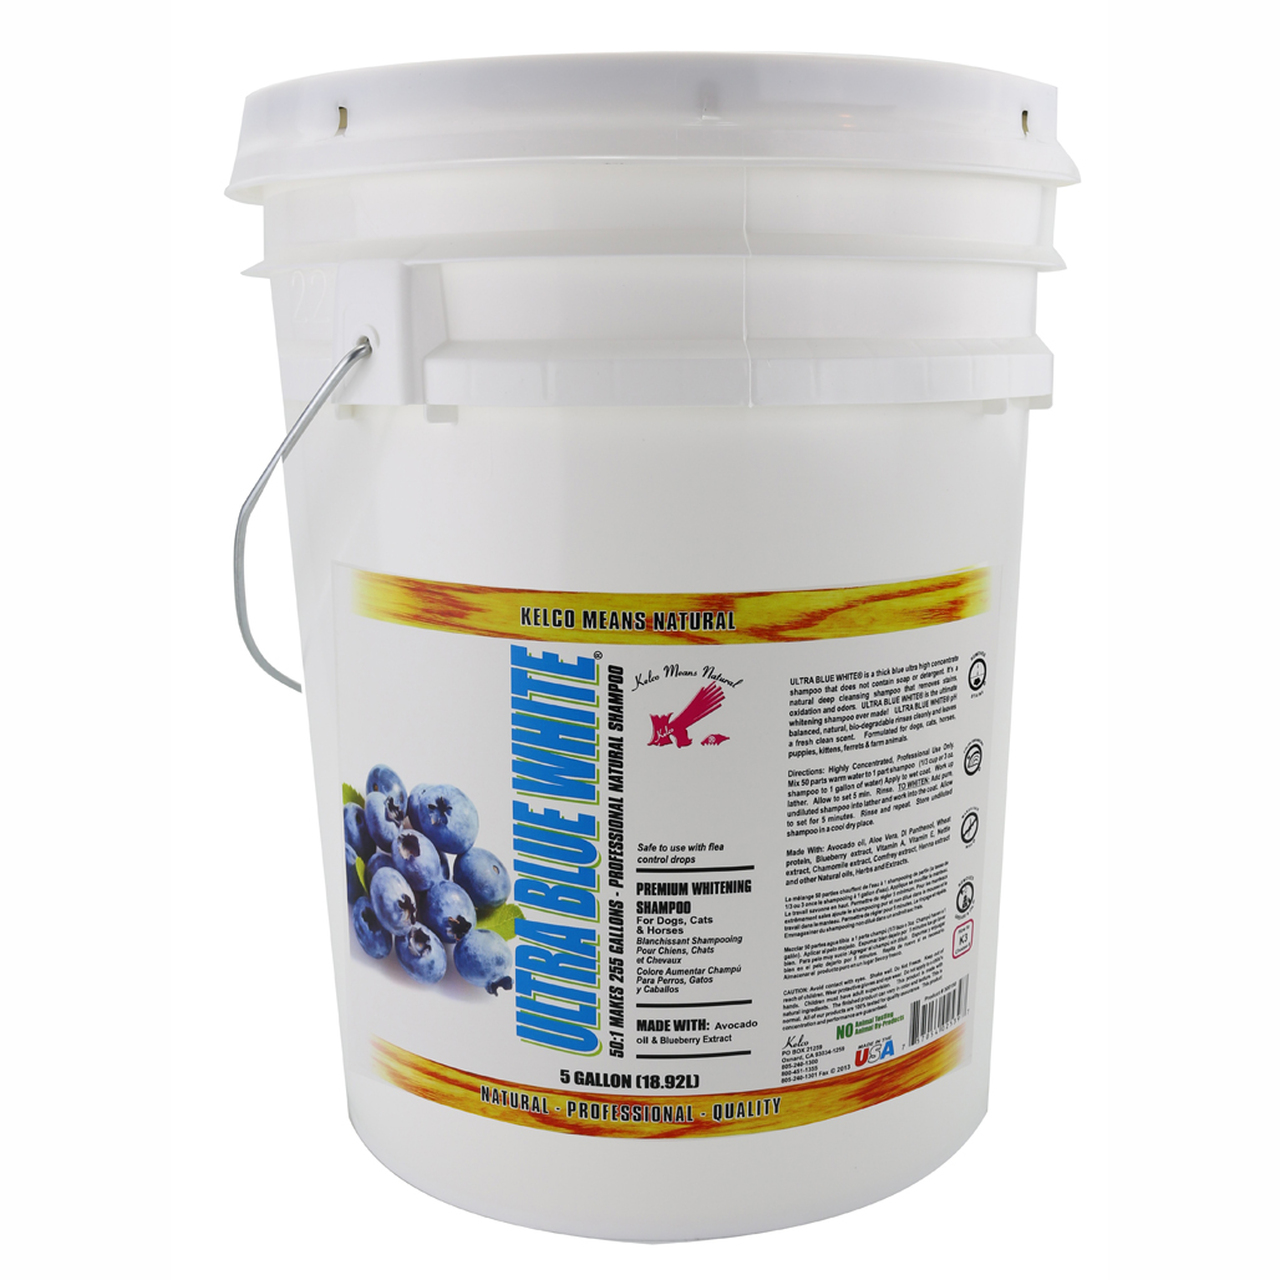 Kelco Ultra Blue White Shampoo in 5 Gallon Size